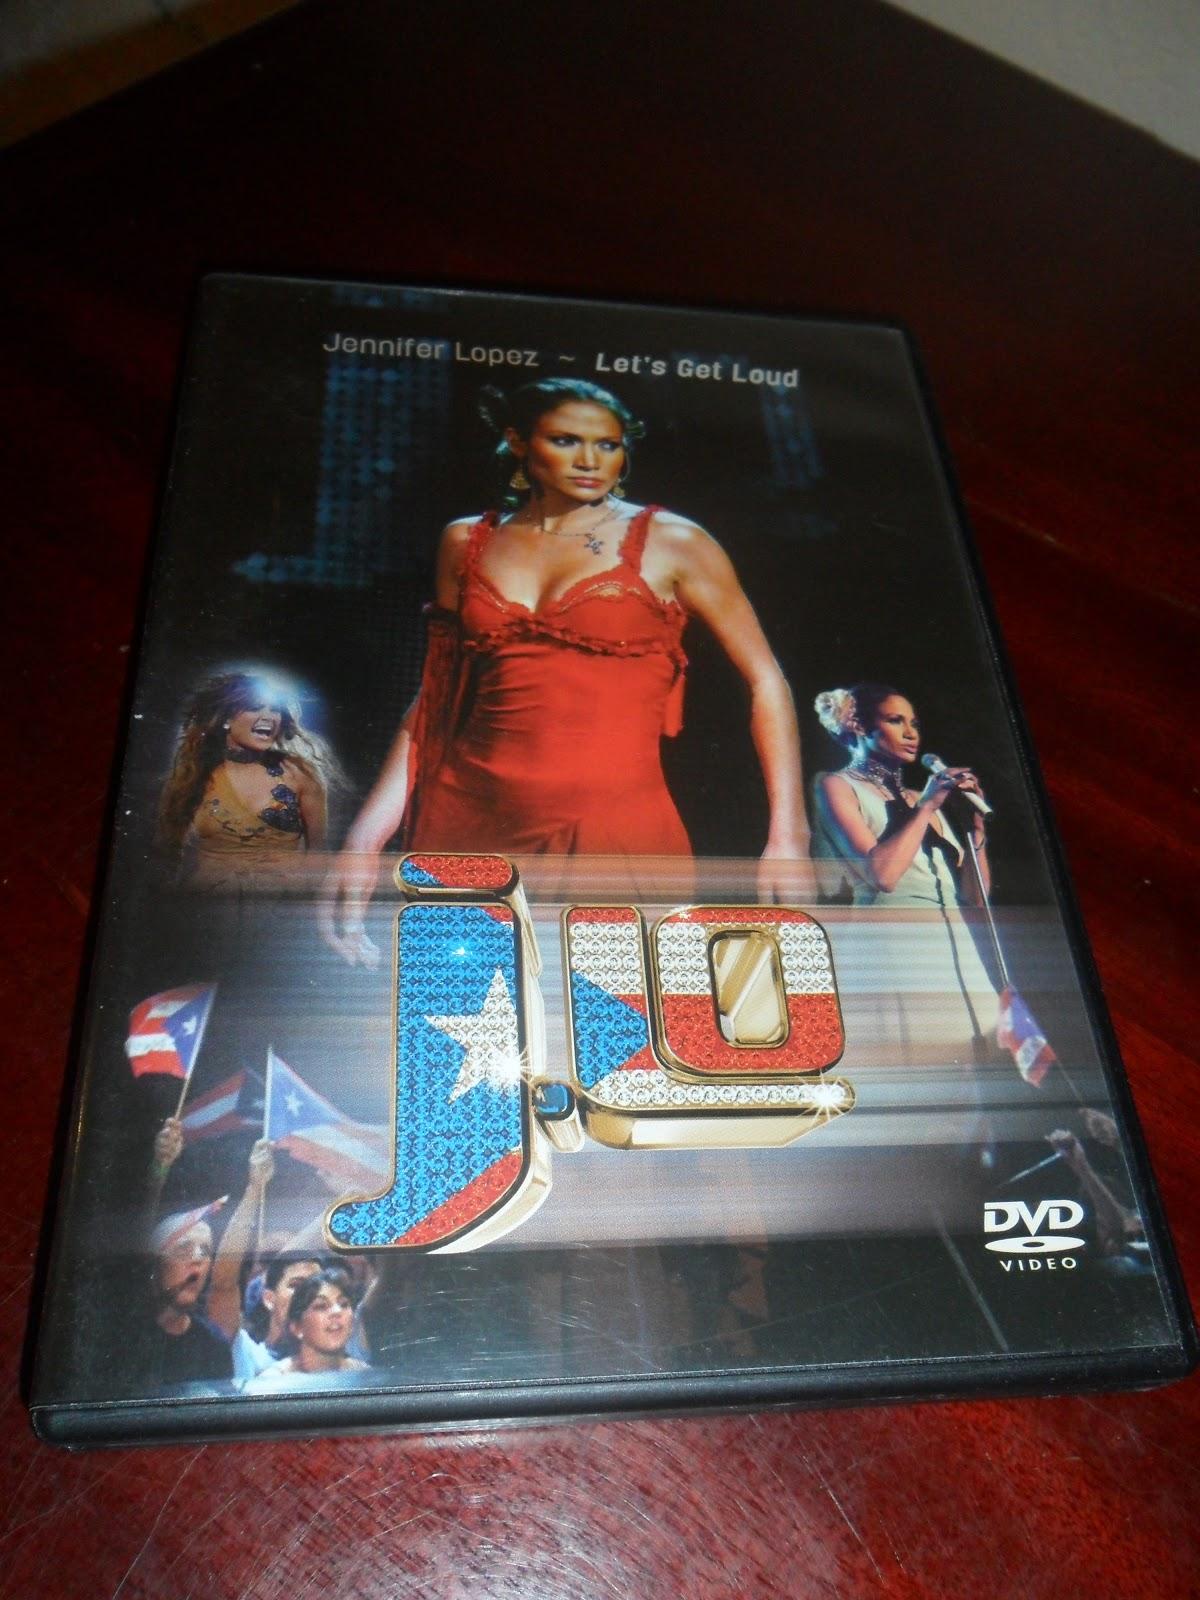 http://3.bp.blogspot.com/-JwrpBu6qknM/Tk_icxbn7YI/AAAAAAAABaw/WTQYVZfeY-g/s1600/Cole%25C3%25A7%25C3%25A3o+DVD+Jennifer+Lopez.JPG